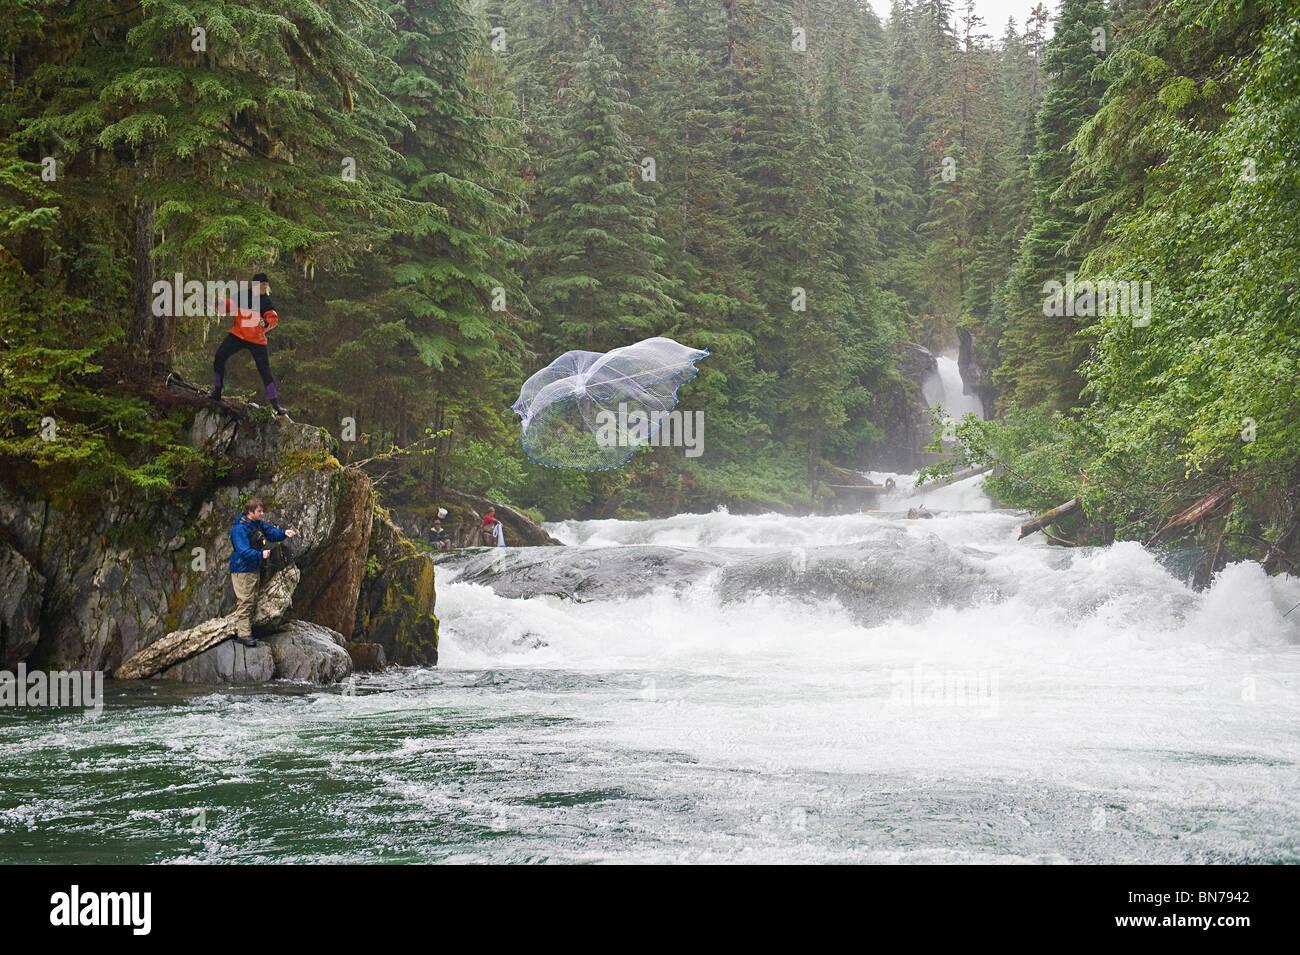 Two fishermen use a cast net to fish for Sockeye salmon in Sweetheart Creek in Alaska - Stock Image